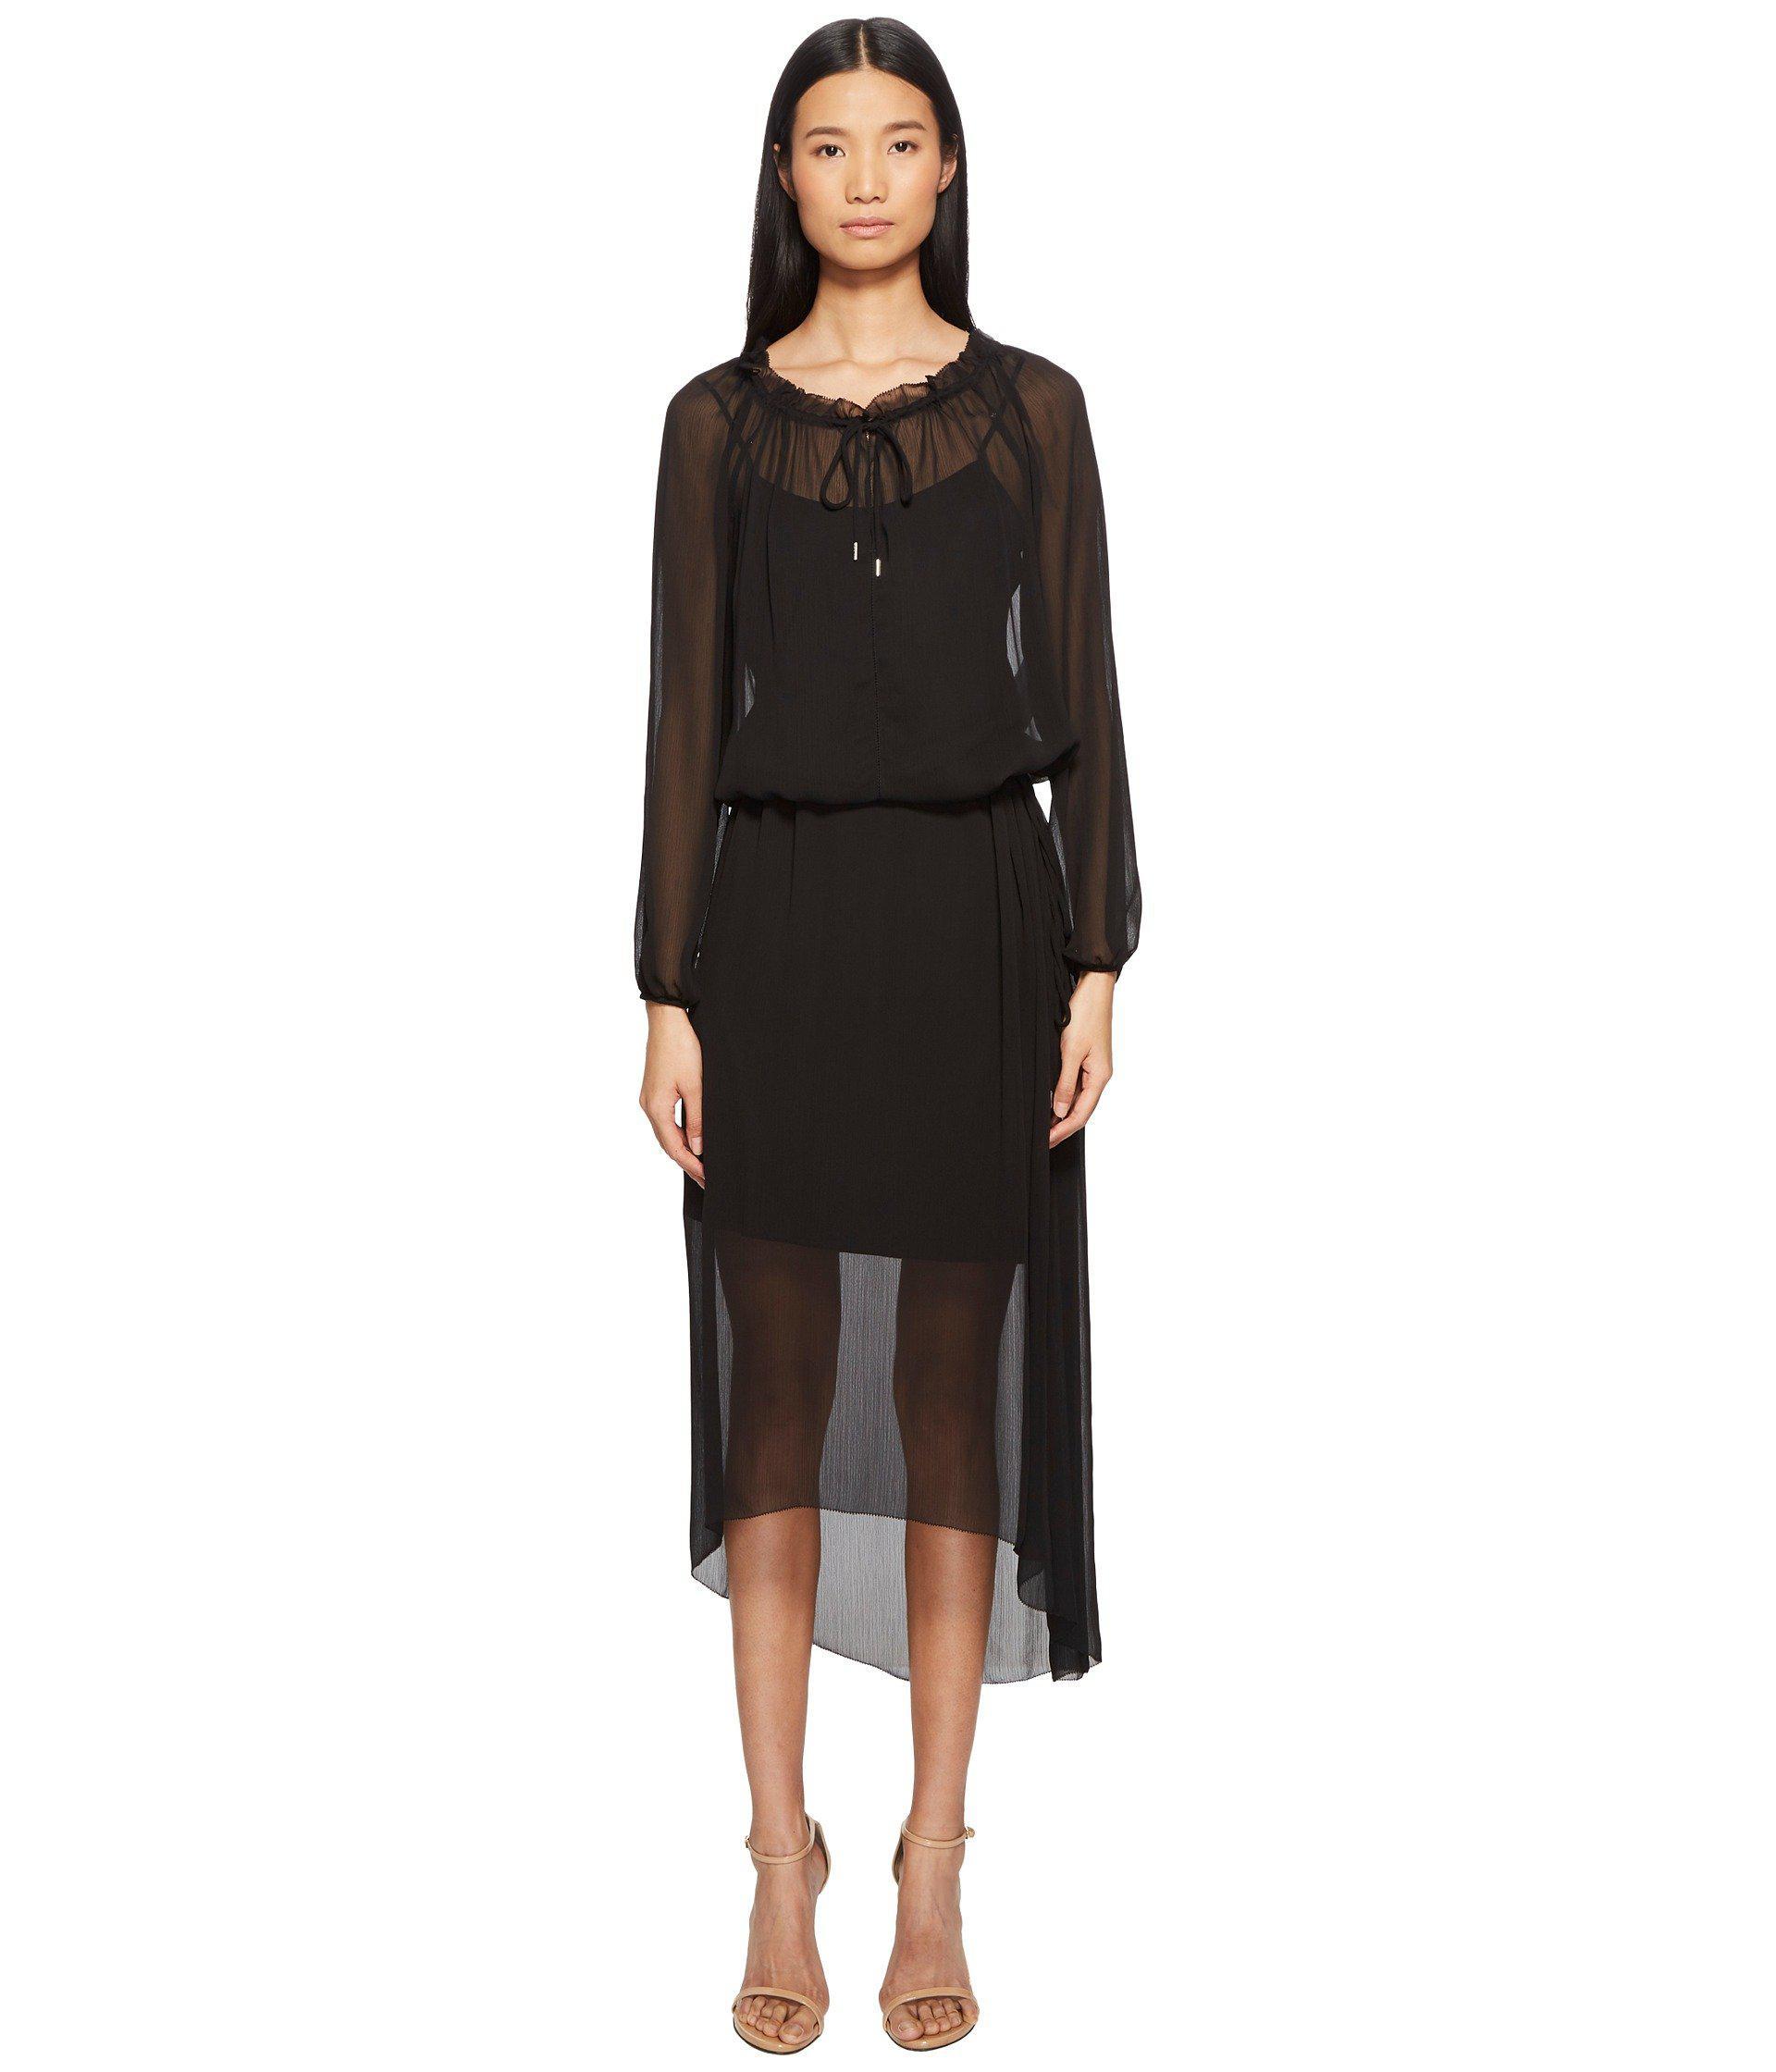 ad81e5daa64e3 Lyst - ESCADA Daluna Long Sleeve Sheer Overlay Dress in Black - Save 70%